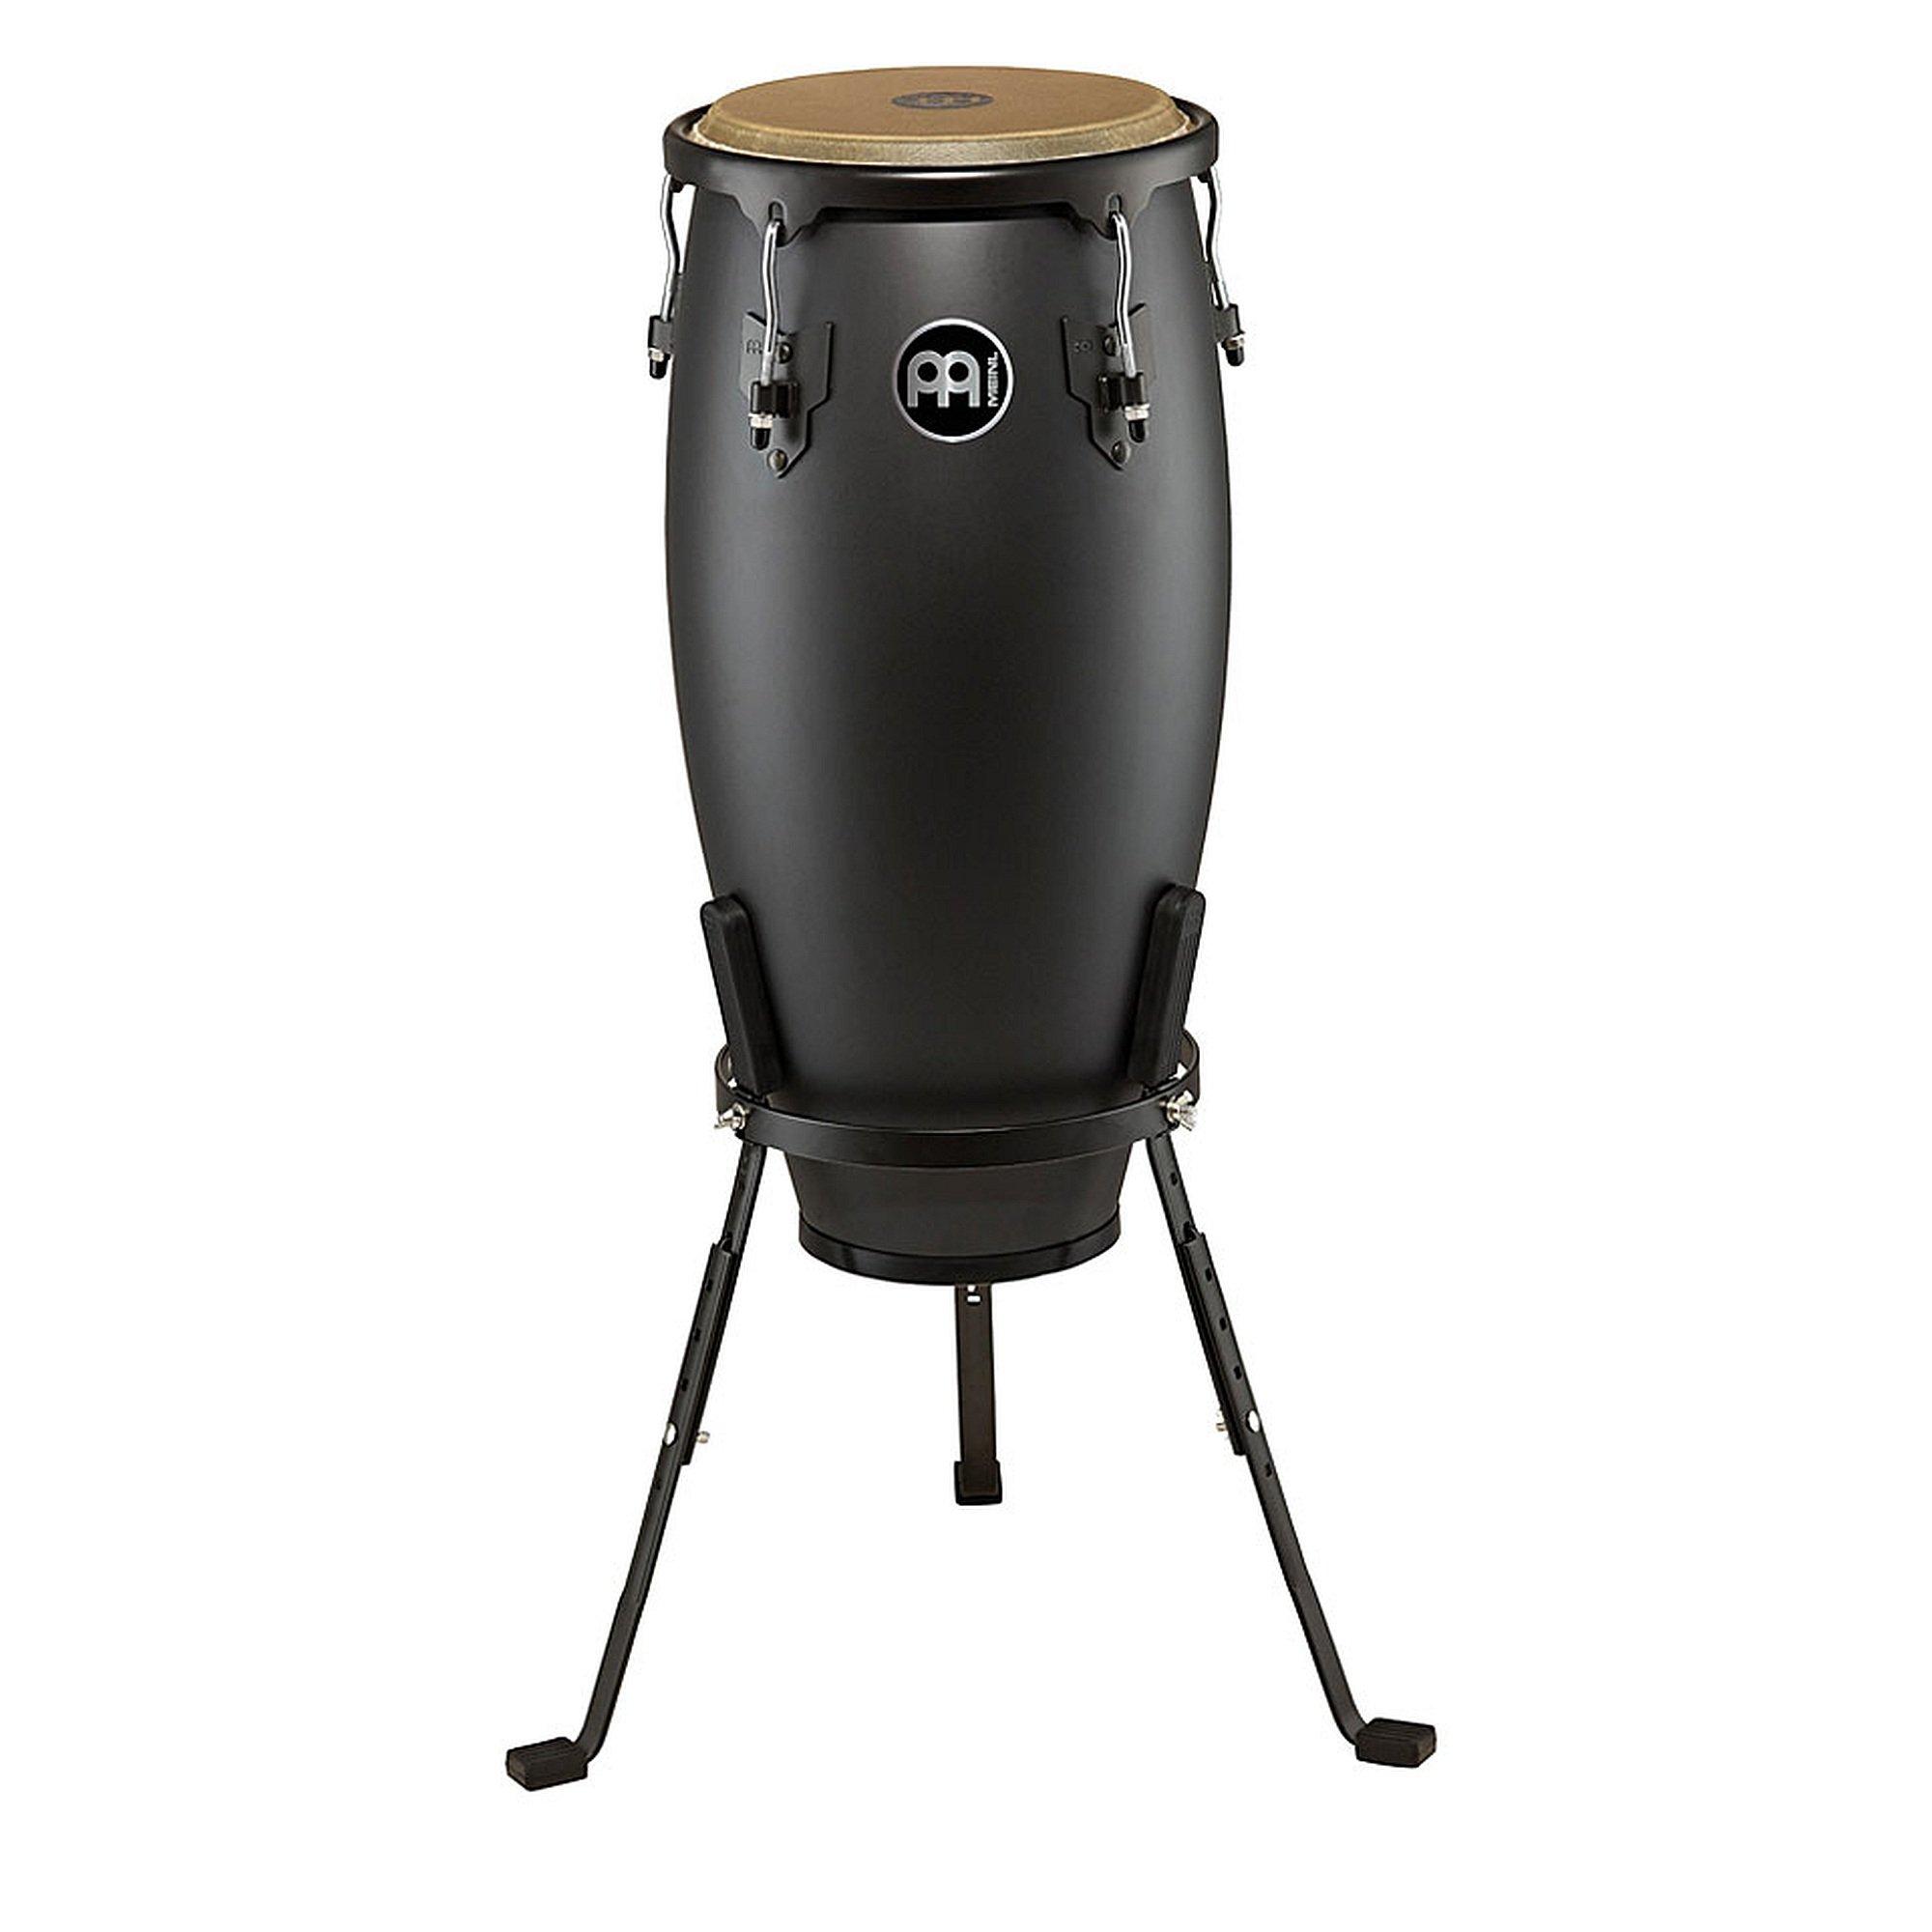 Meinl Percussion HC11PBK-M Headliner Designer Series 11-Inch Quinto with Basket Stand, Phantom Black